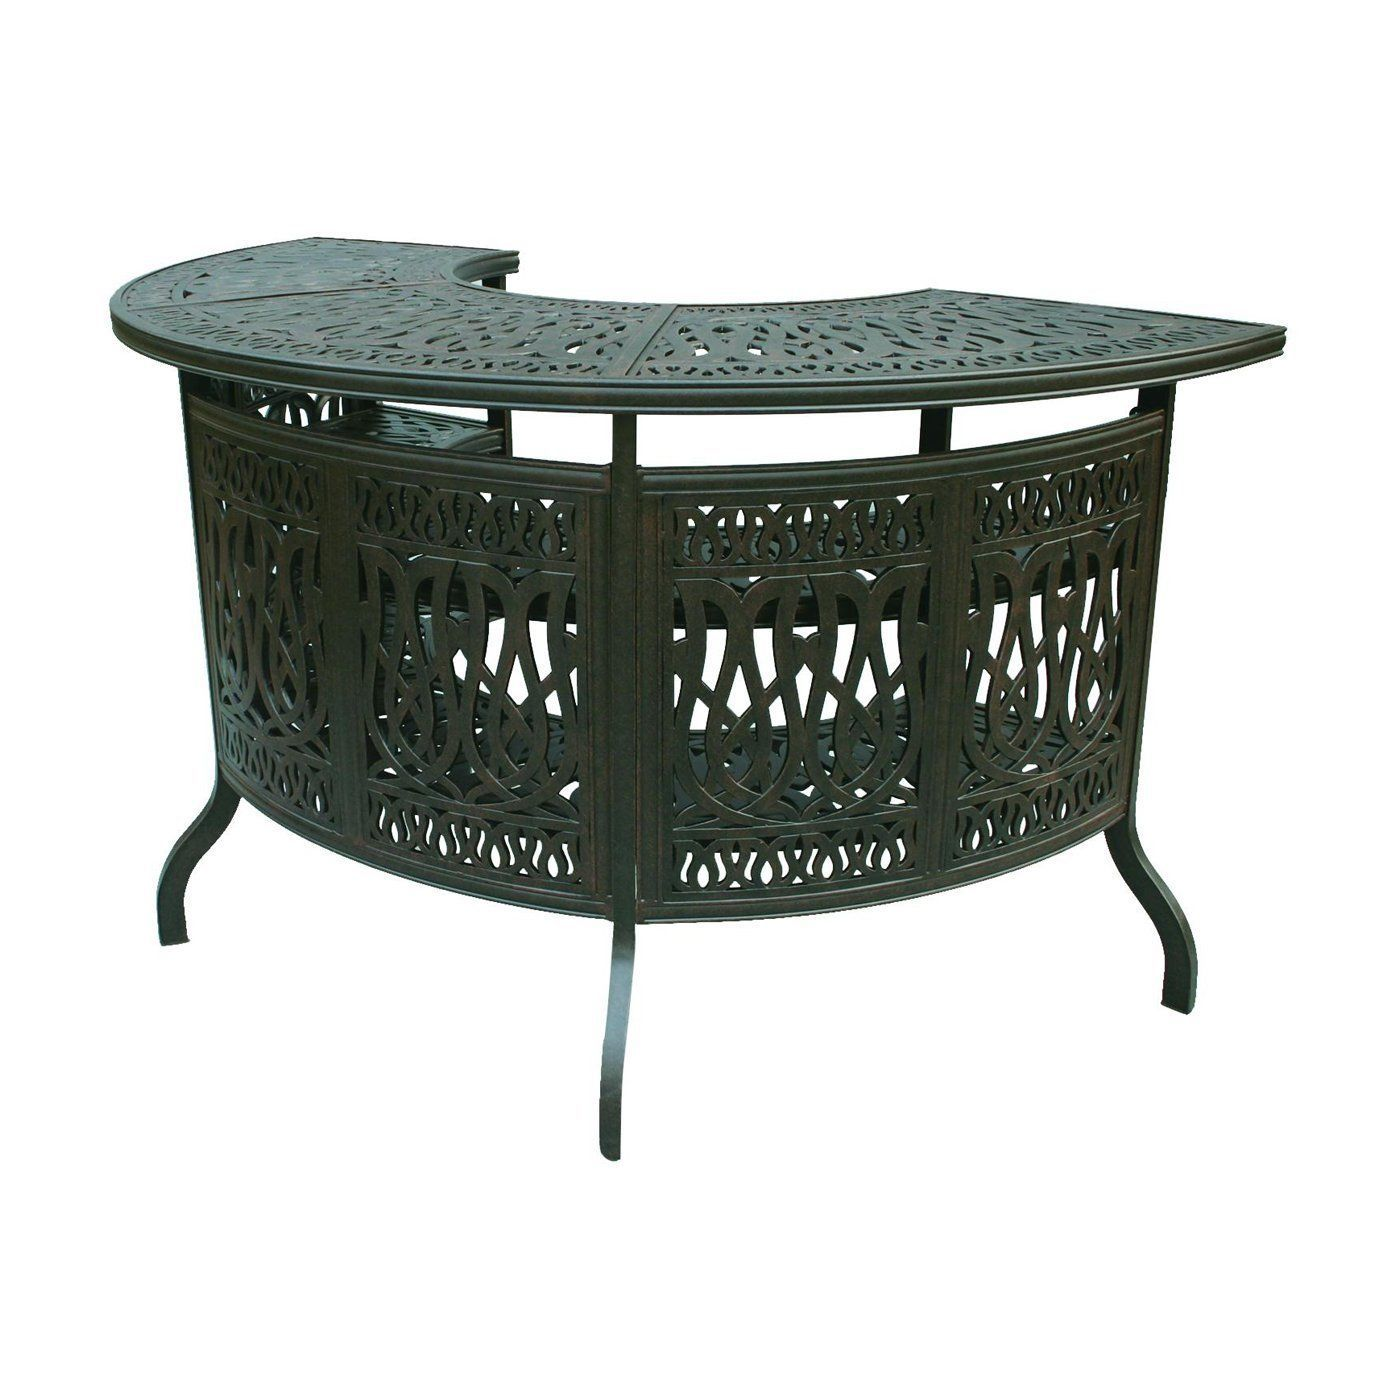 Outdoor bar table Elisabeth cast aluminum all weather patio furniture Bronze